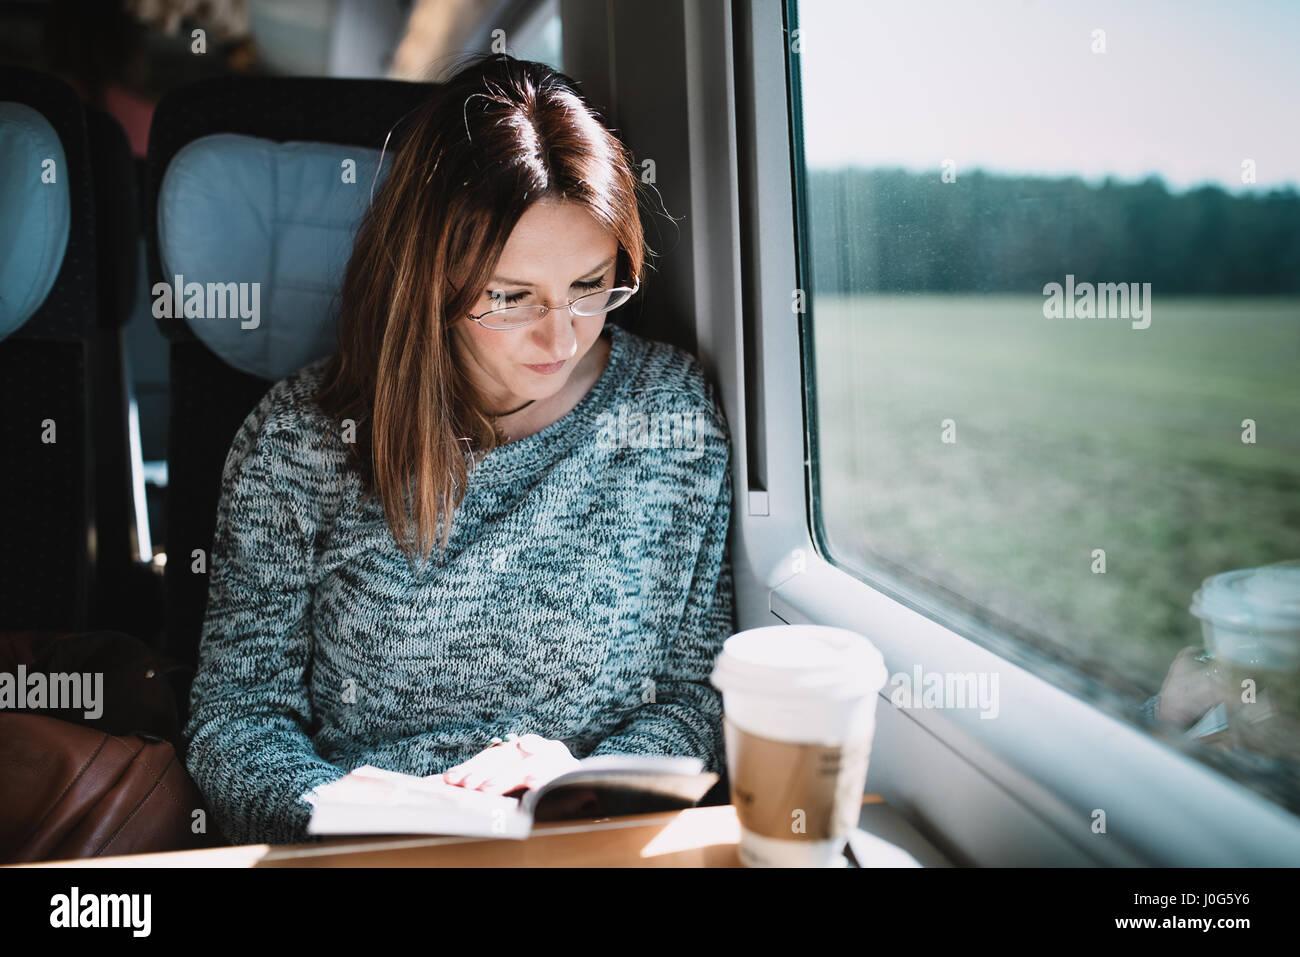 women reading book on the train stock photo 138038858 alamy